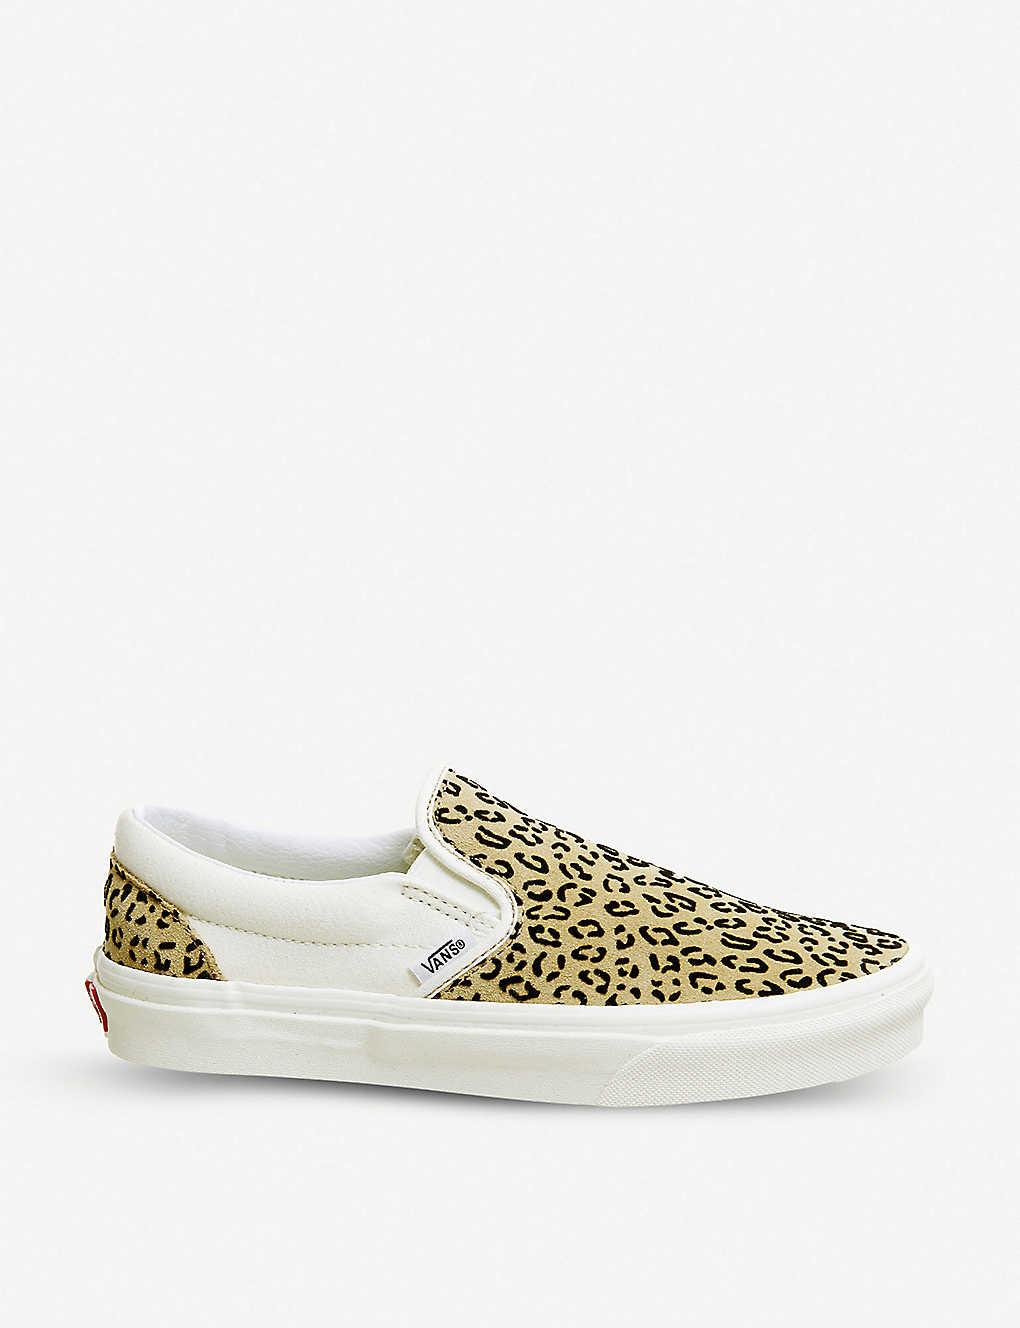 VANS - Classic leopard print canvas slip-on sneakers  954a03c04